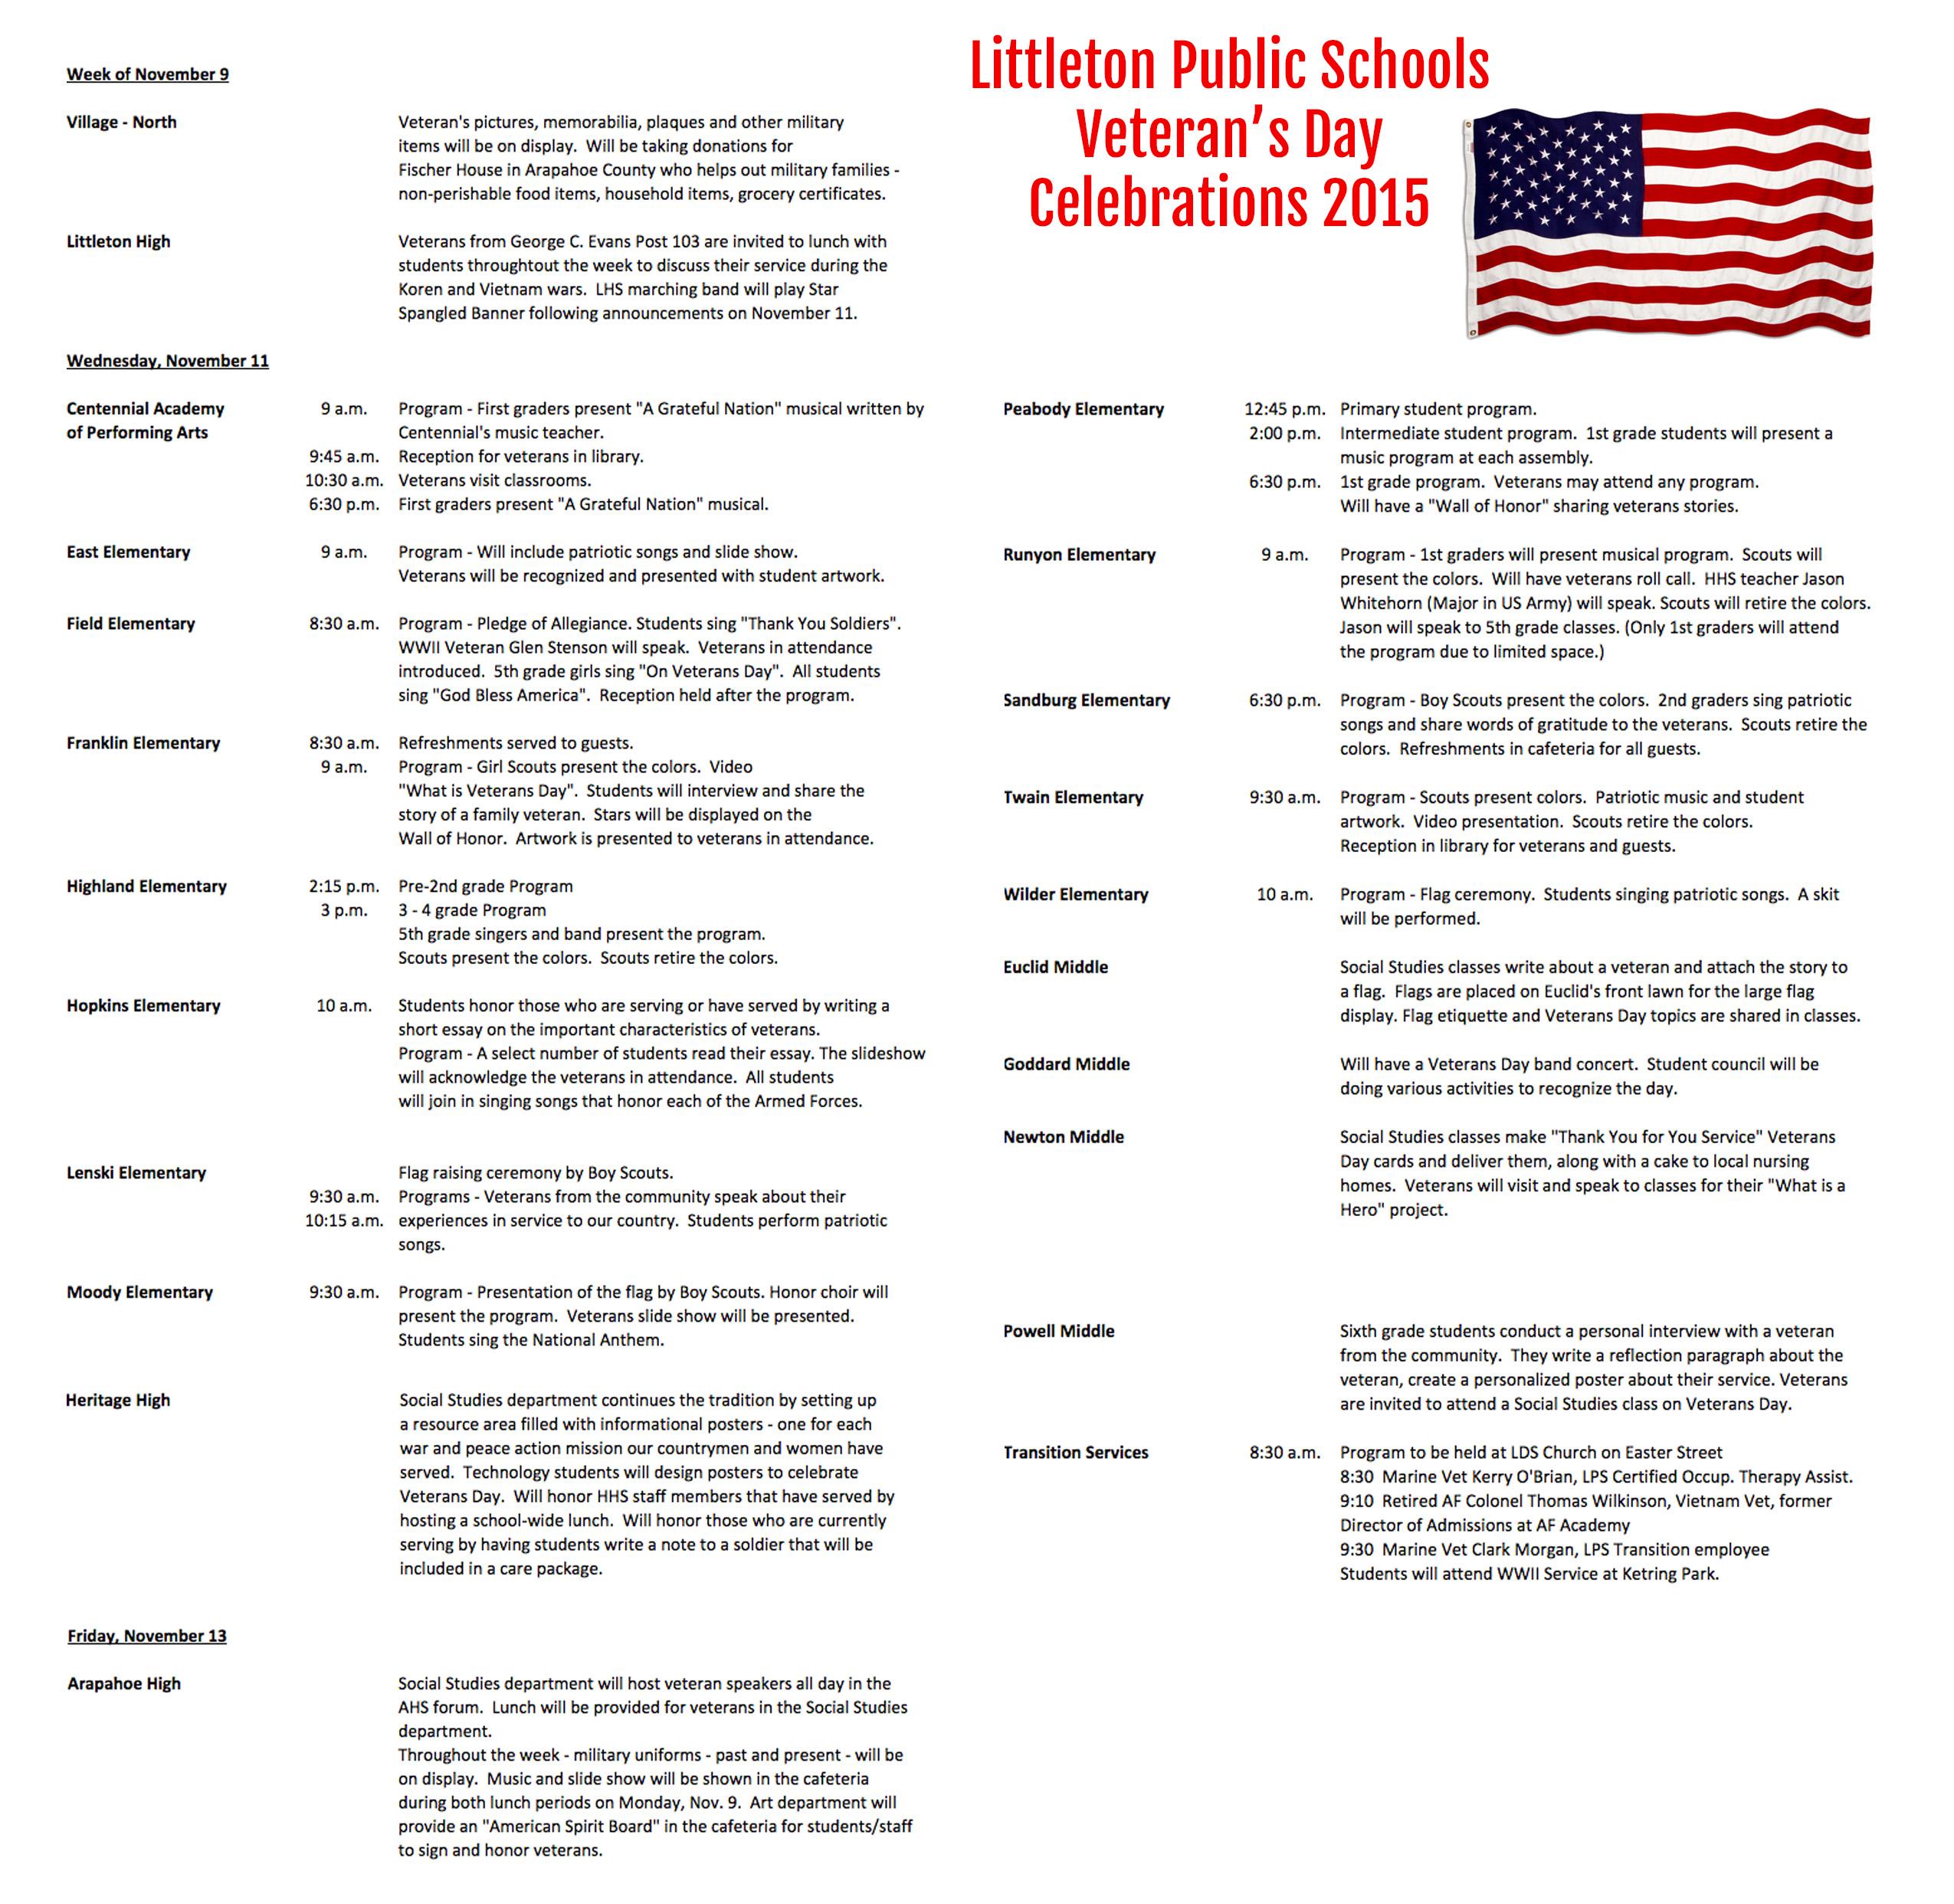 012 Essay Example Veterans Lps Honors Littleton Public Schools Veteran Day Exa Best Writing Prompts Elementary Contest Ideas Full